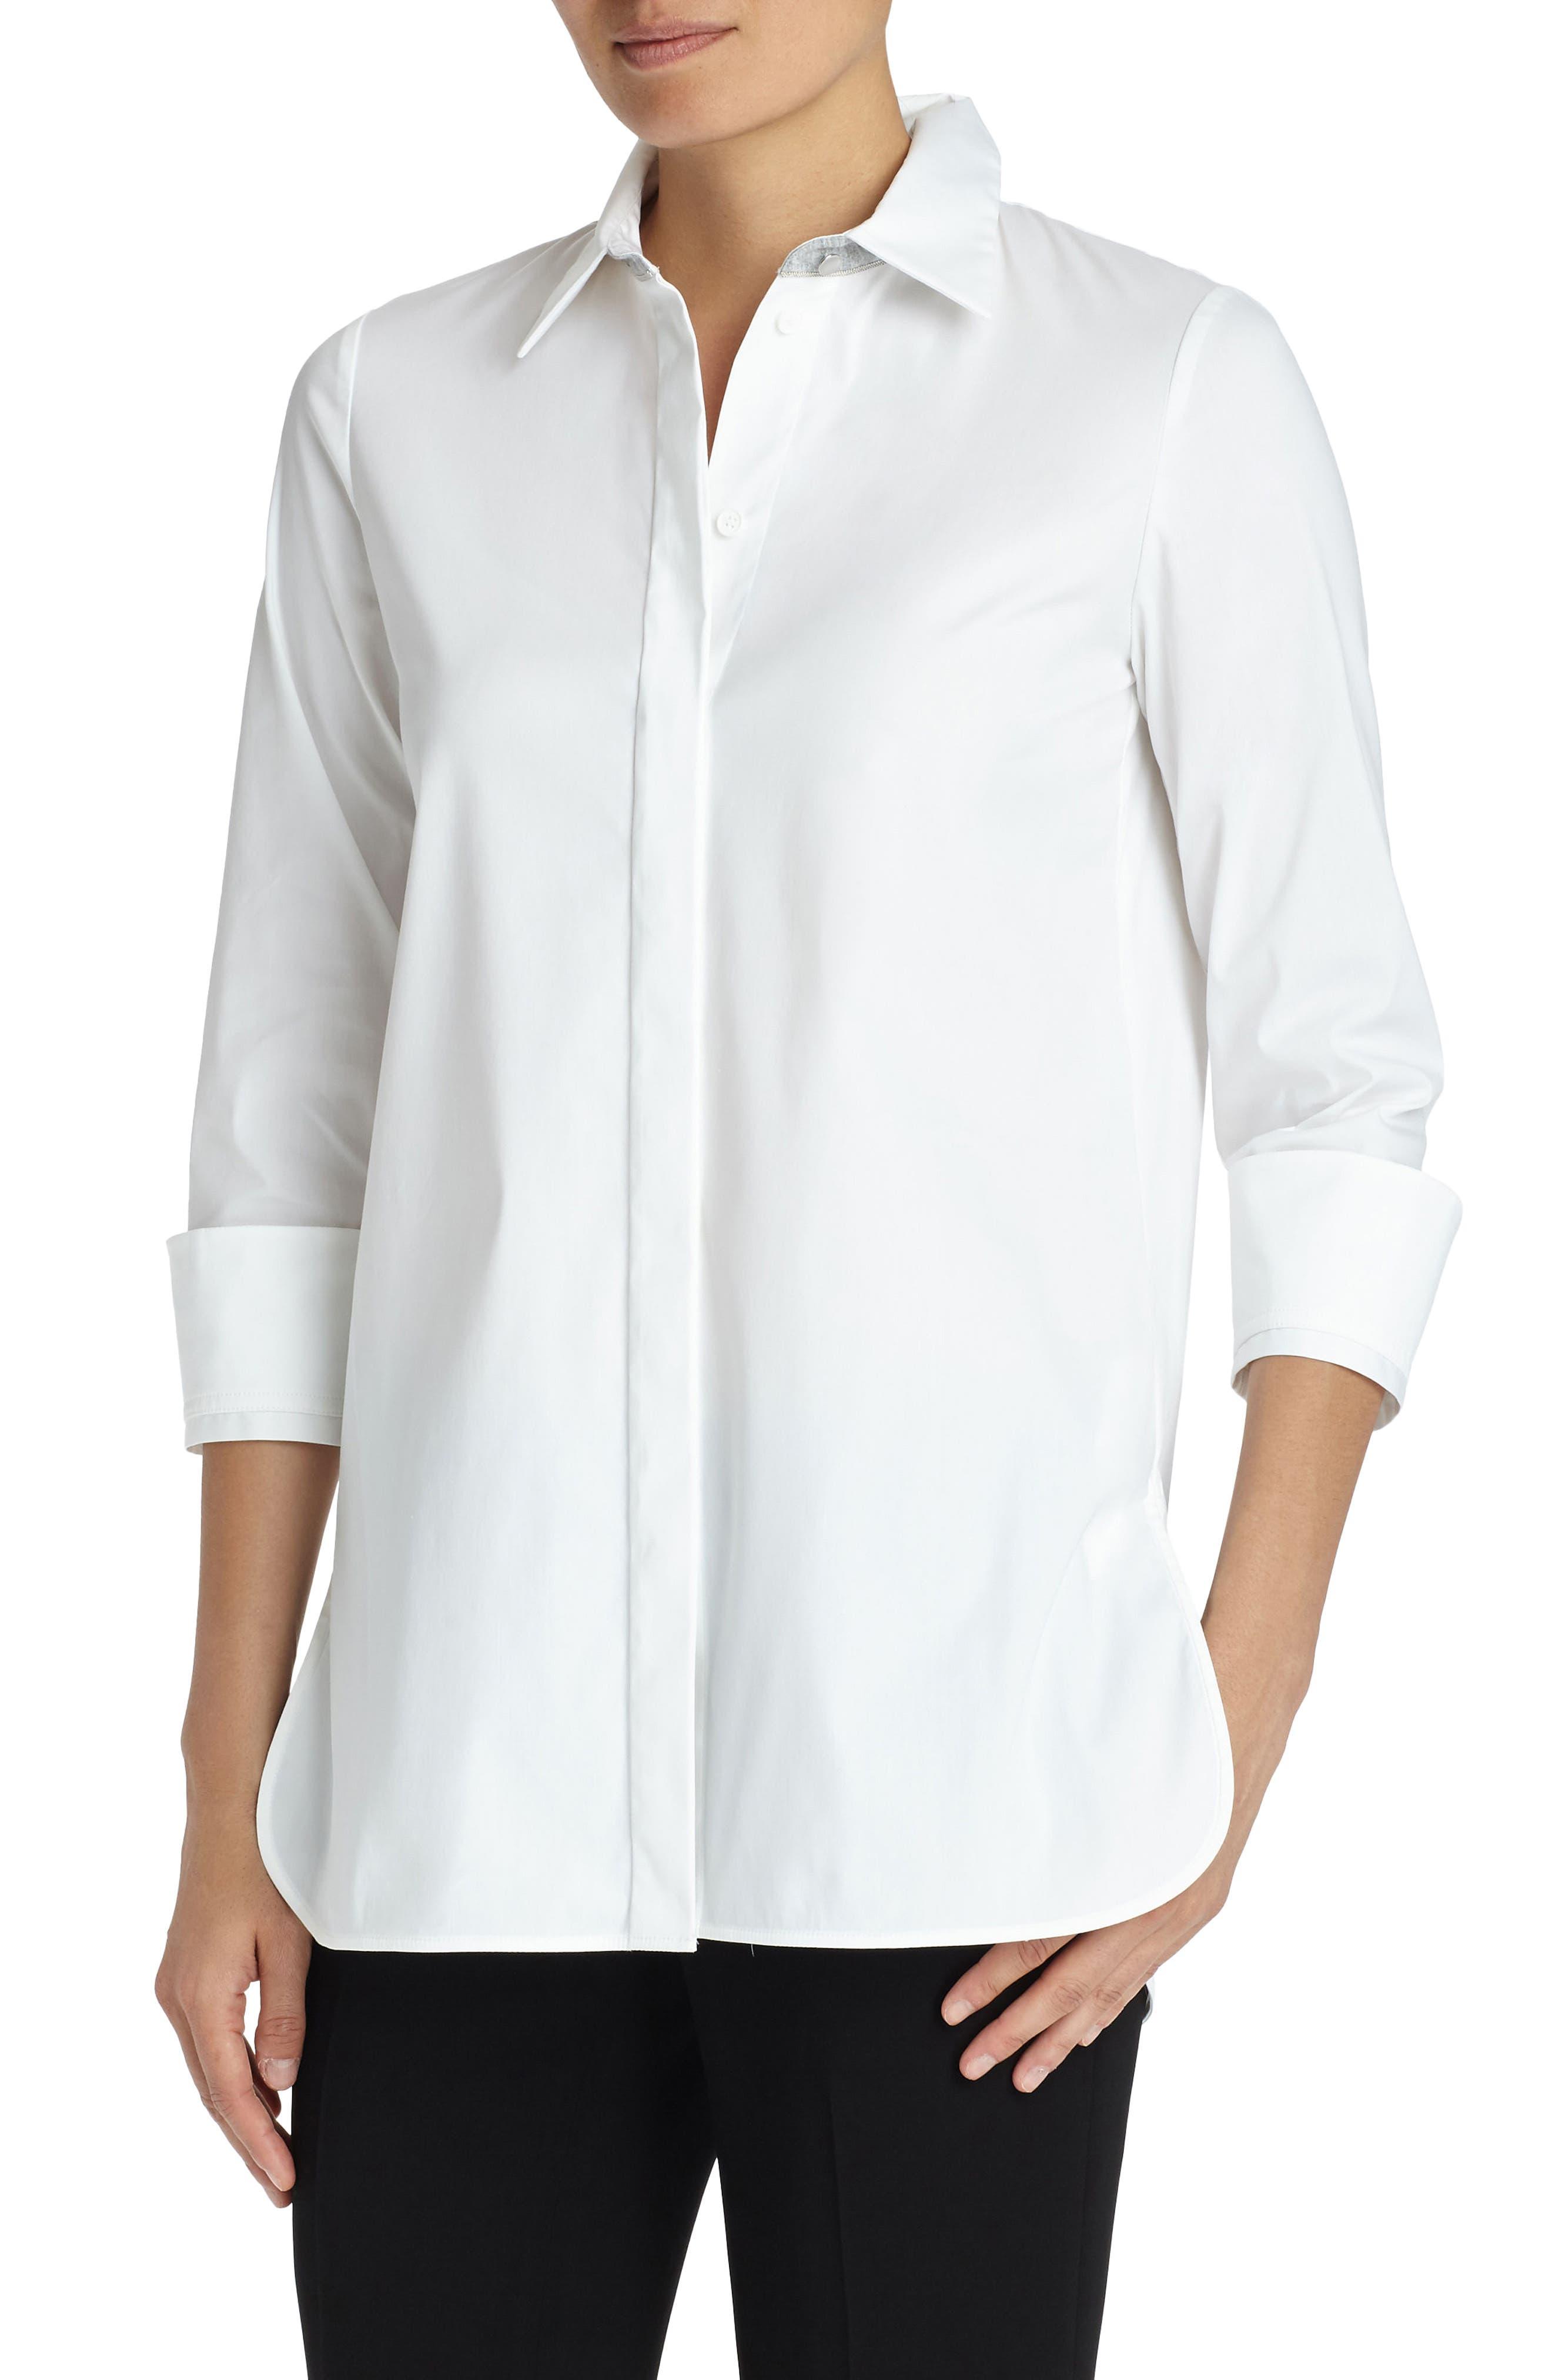 Augusta Stretch Cotton Shirt,                             Main thumbnail 1, color,                             100